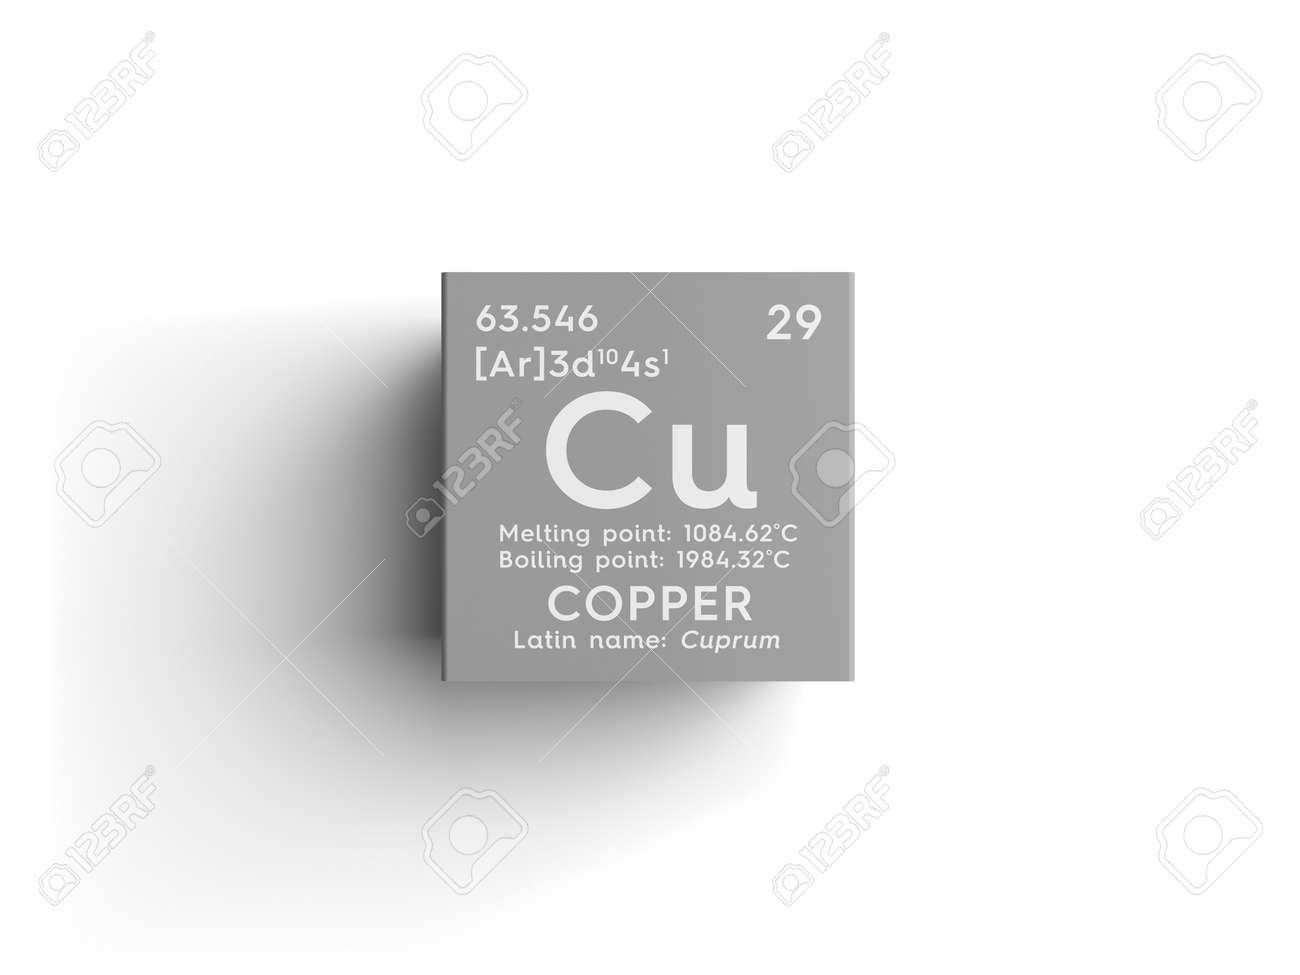 Copper cuprum transition metals chemical element of mendeleevs copper cuprum transition metals chemical element of mendeleevs periodic table copper in urtaz Choice Image